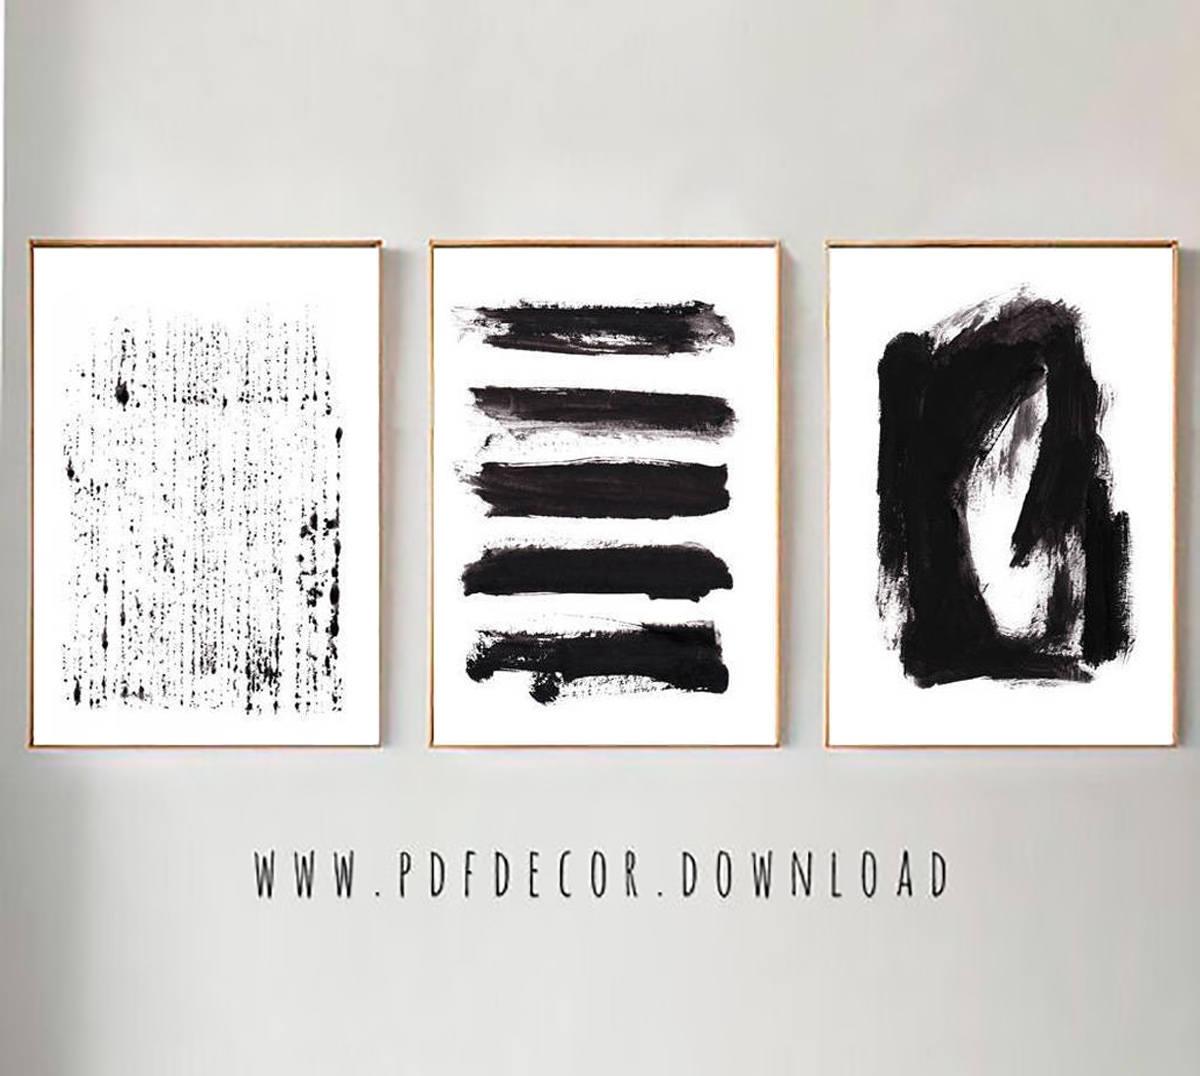 Set Of 3 Black Abstract Prints, Set Of 3 Wall Art, Abstract Wall Art pertaining to Black and White Wall Art (Image 18 of 20)